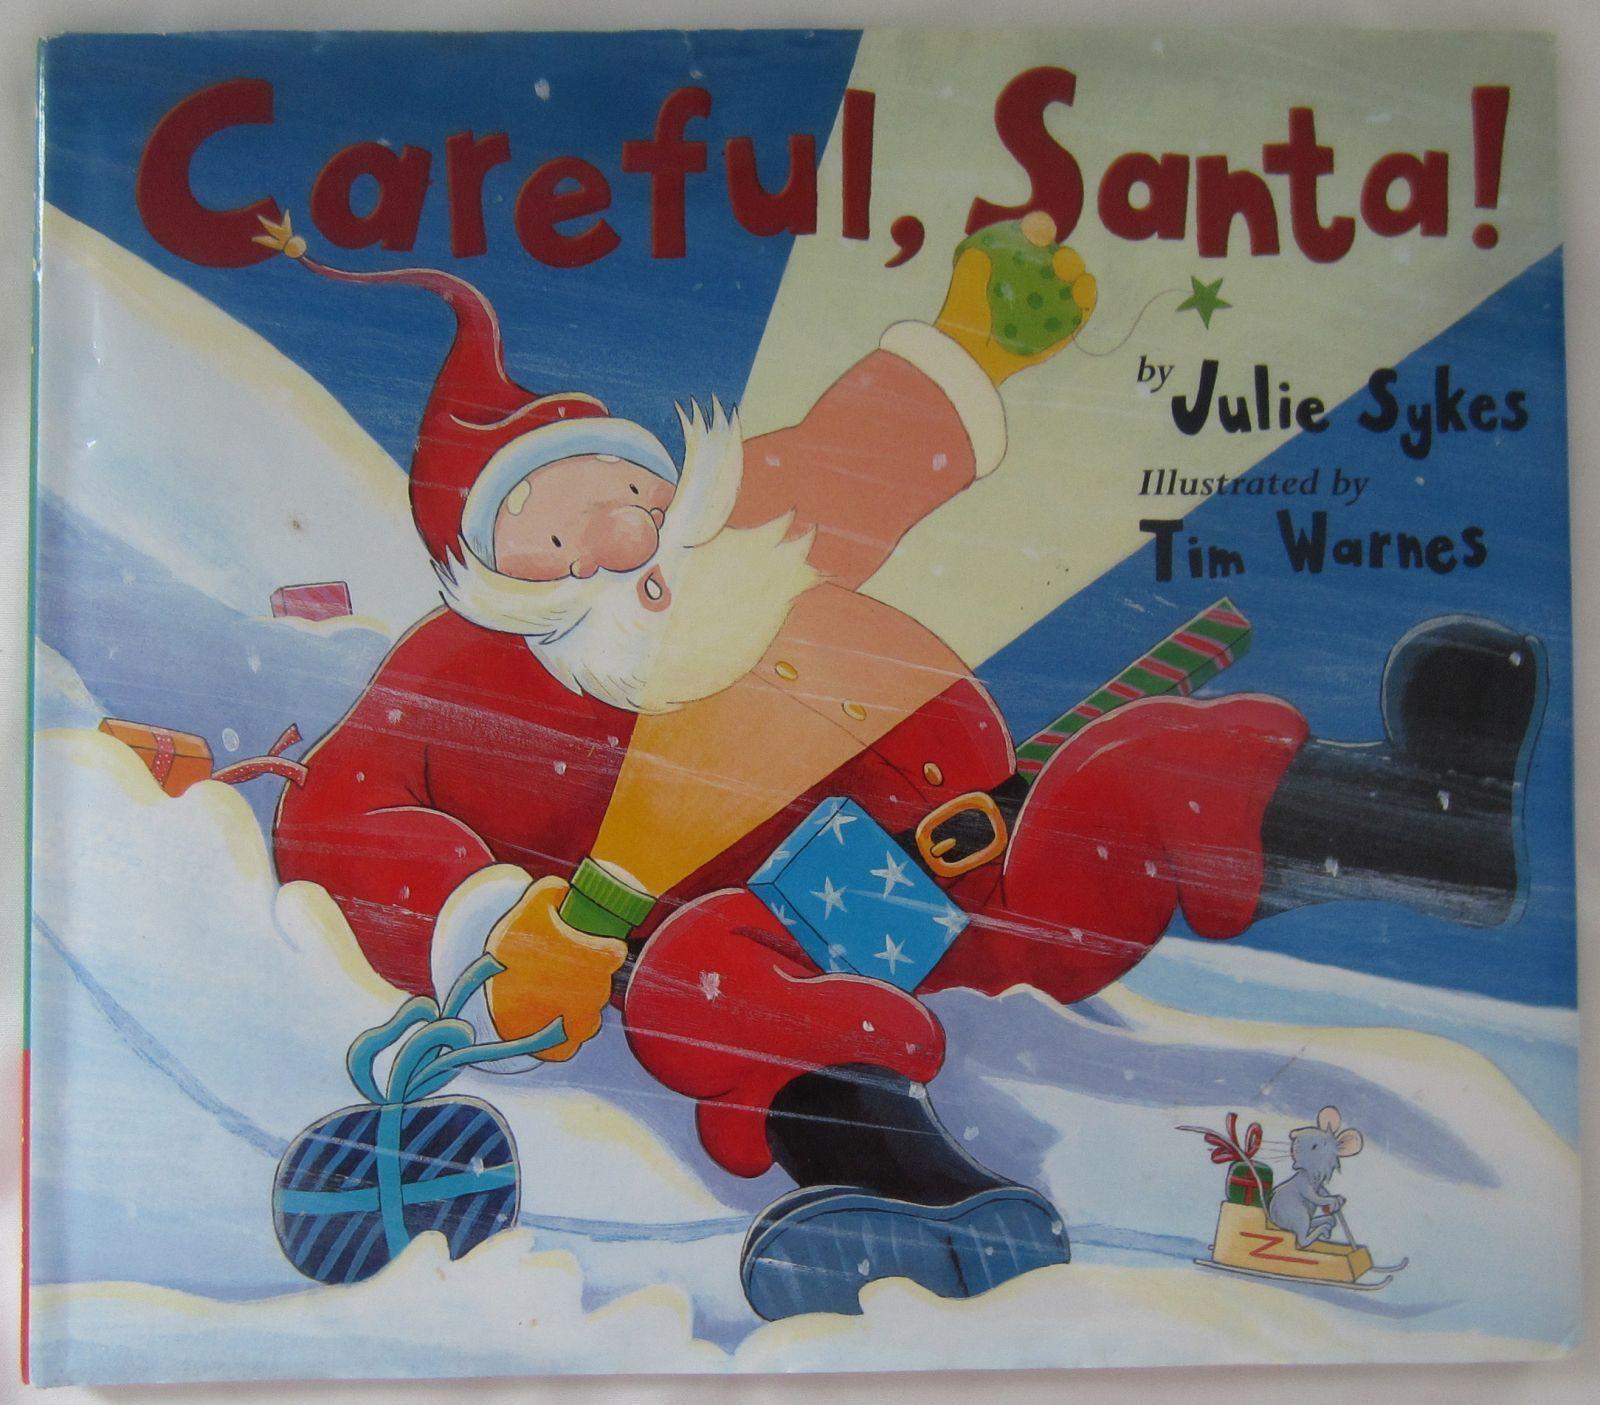 Careful Santa Julie Sykes 1st Ed Hc Dj Book New